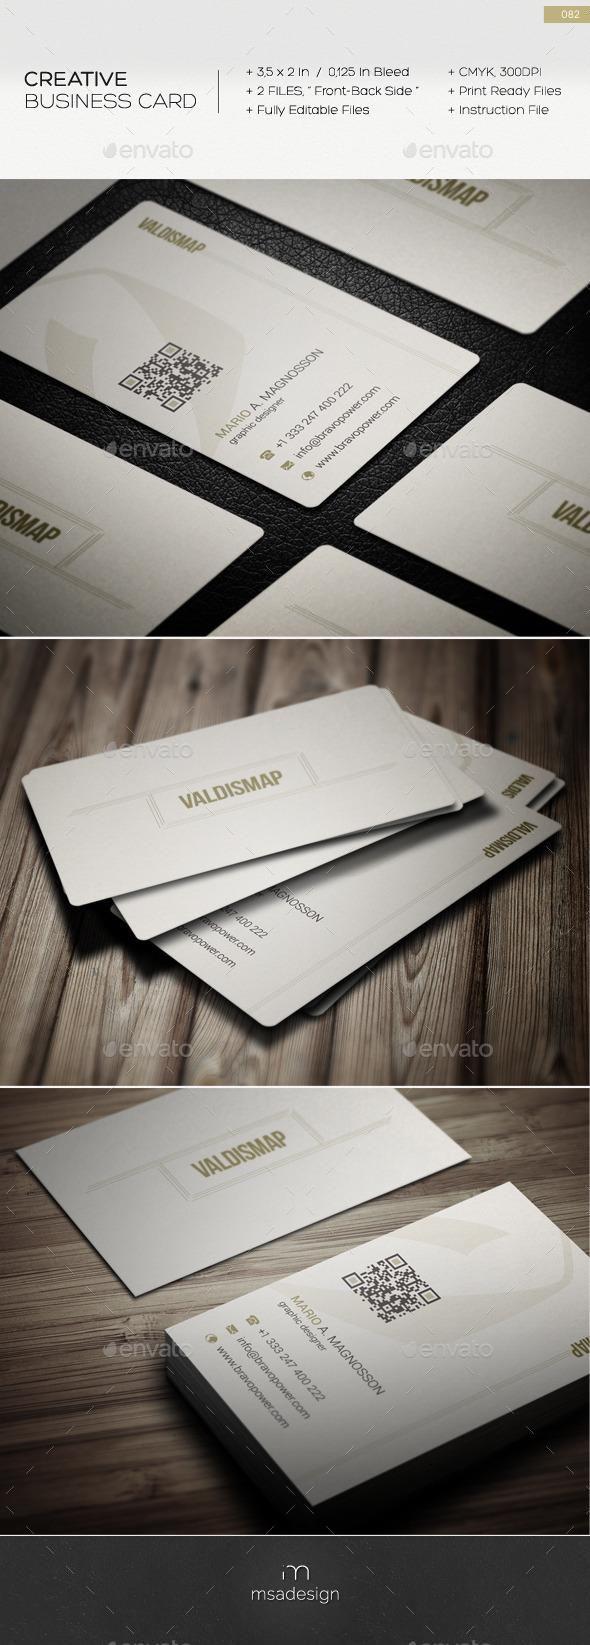 Creative Business Card 082 #template #creative #business